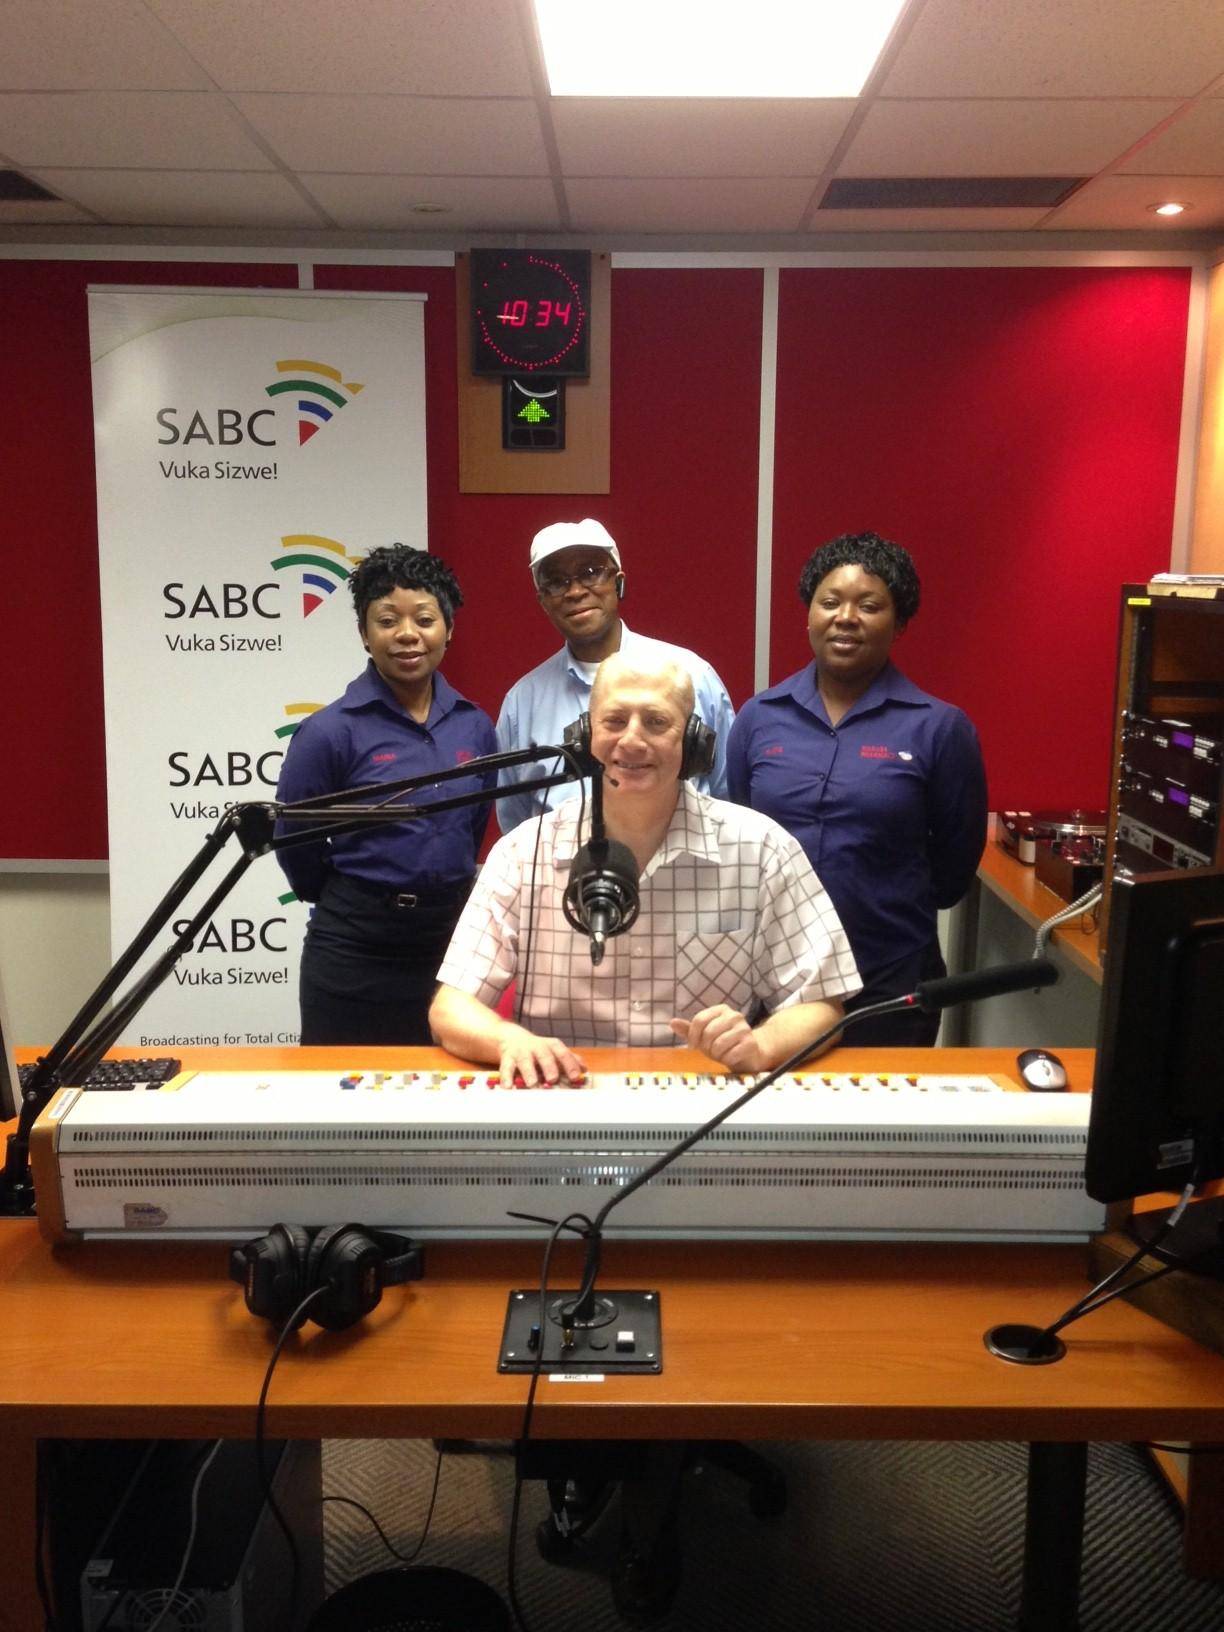 SABC supervisor with staff